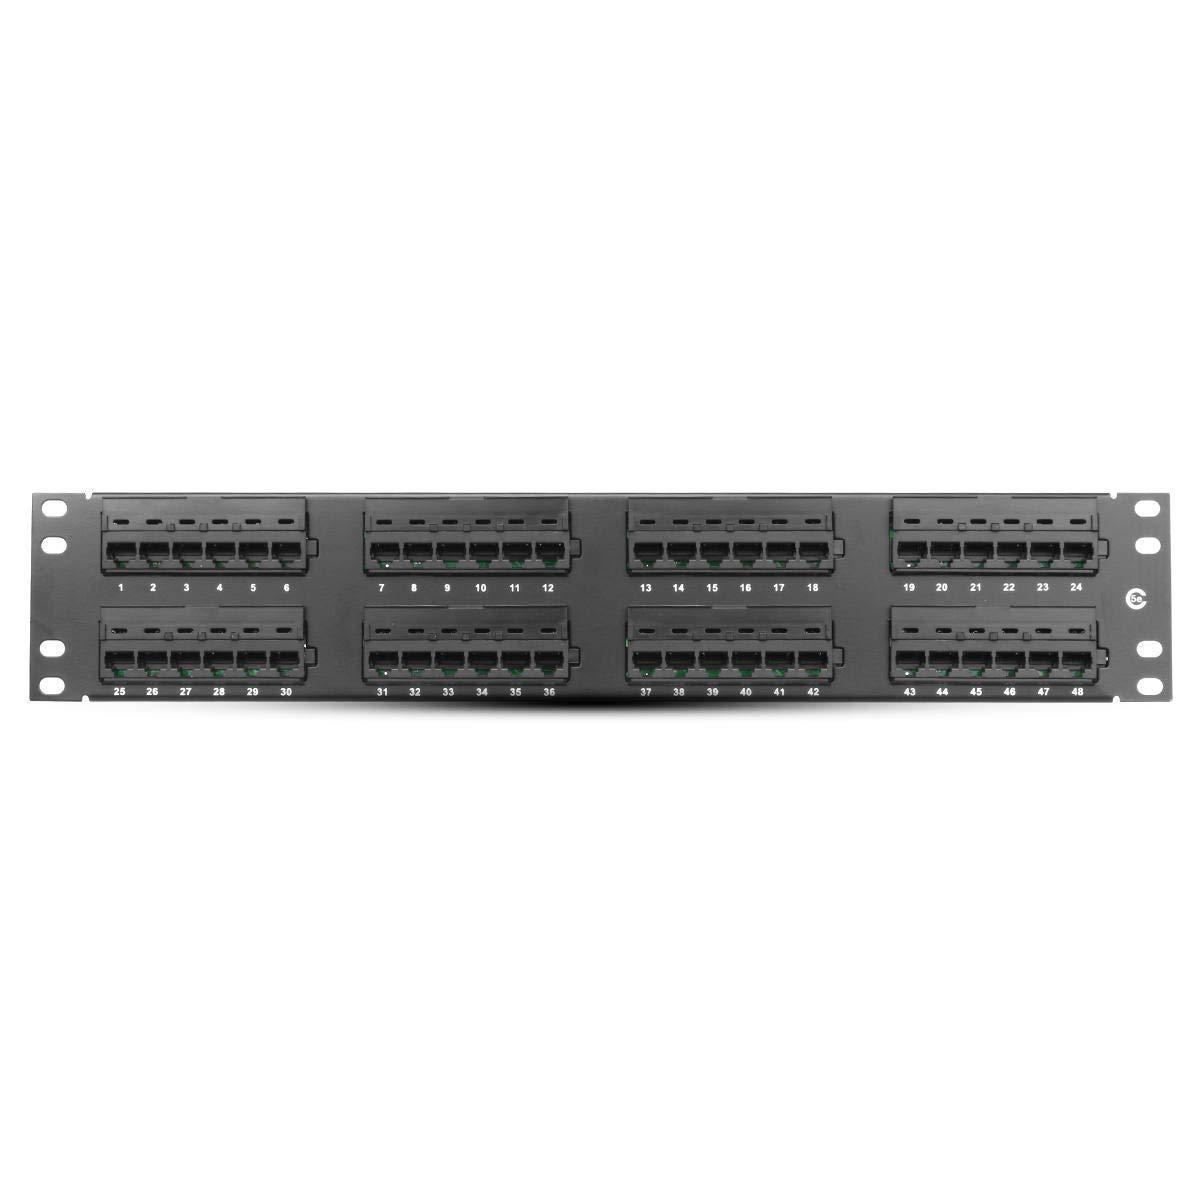 48 Port CAT5e RJ45 110 Network Ethernet Rack Mount 2U 2RU Two Space Patch Panel Connector - Networking Networking Cables & tools - 1 48 Port Cat5e RJ45 110 Network Ethernet Rack Mount 2U 2RU Two